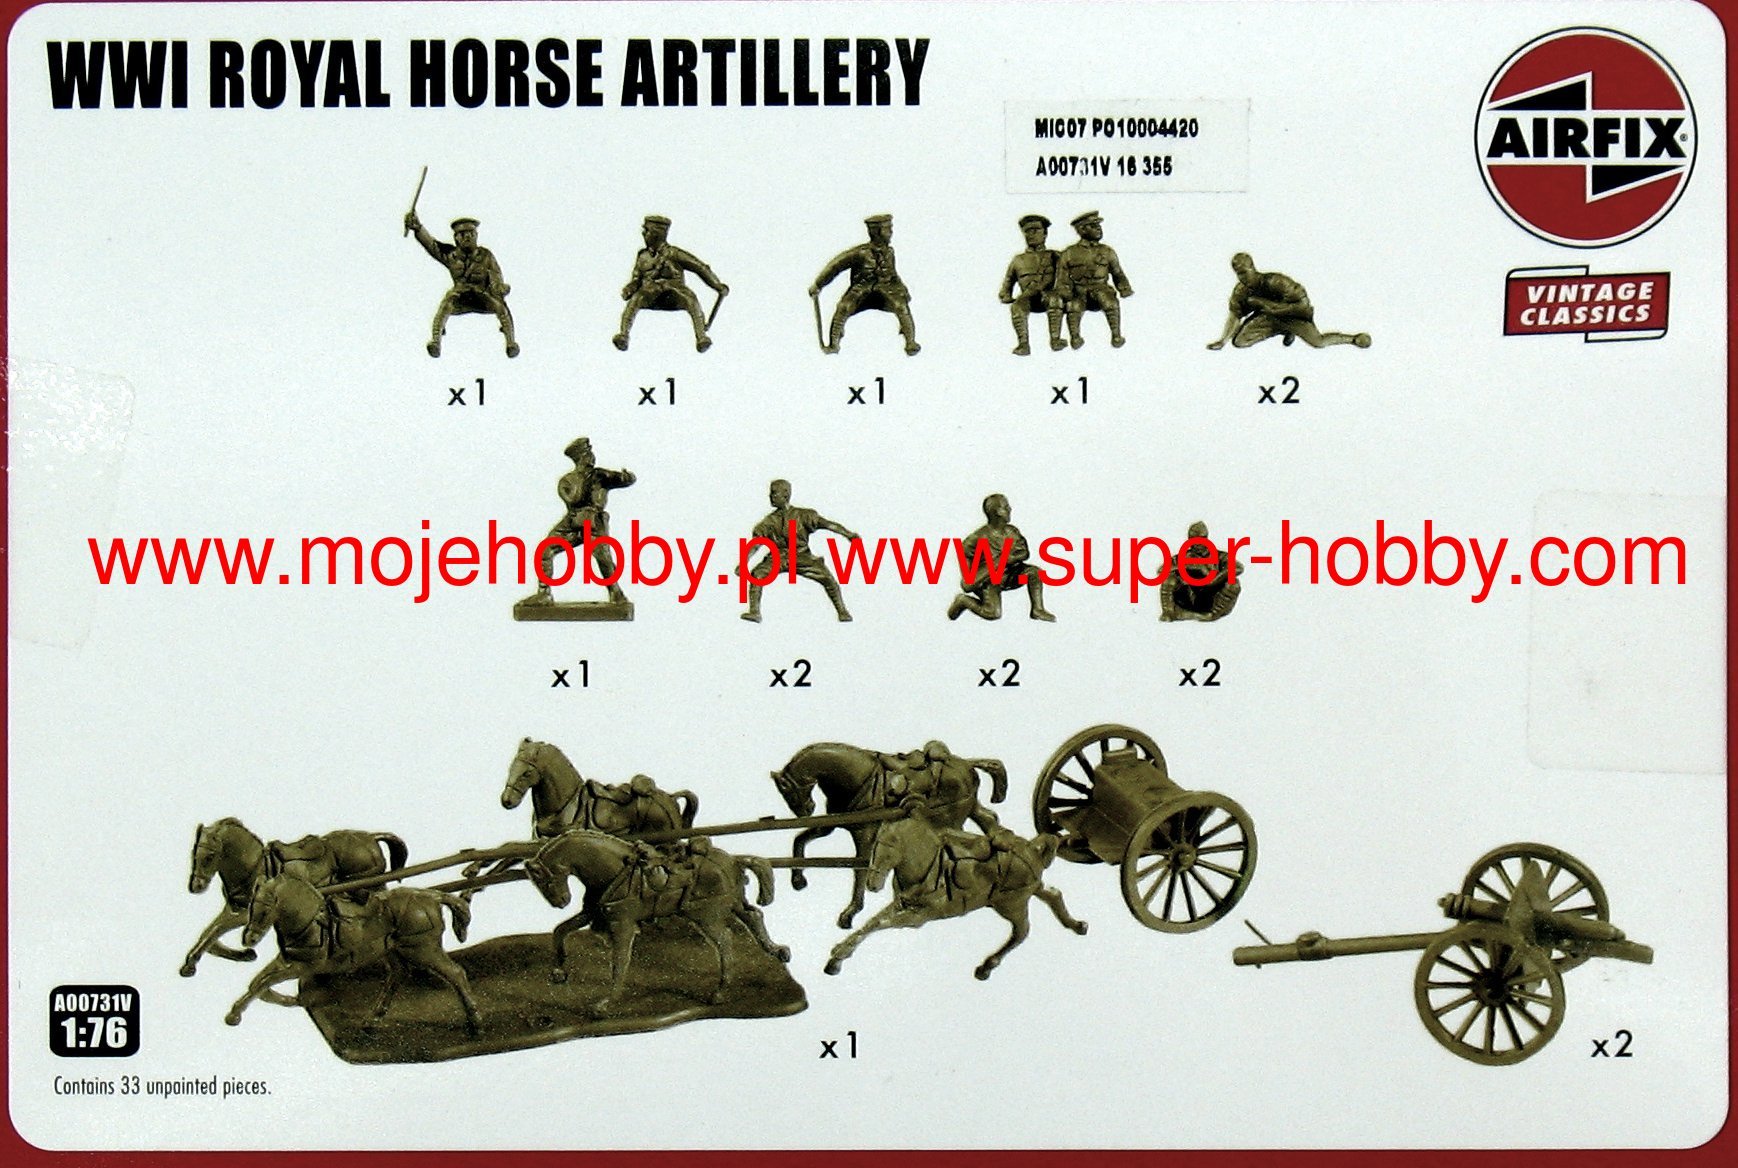 Airfix Airf00731v WWI Royal Horse Artillery 1//76